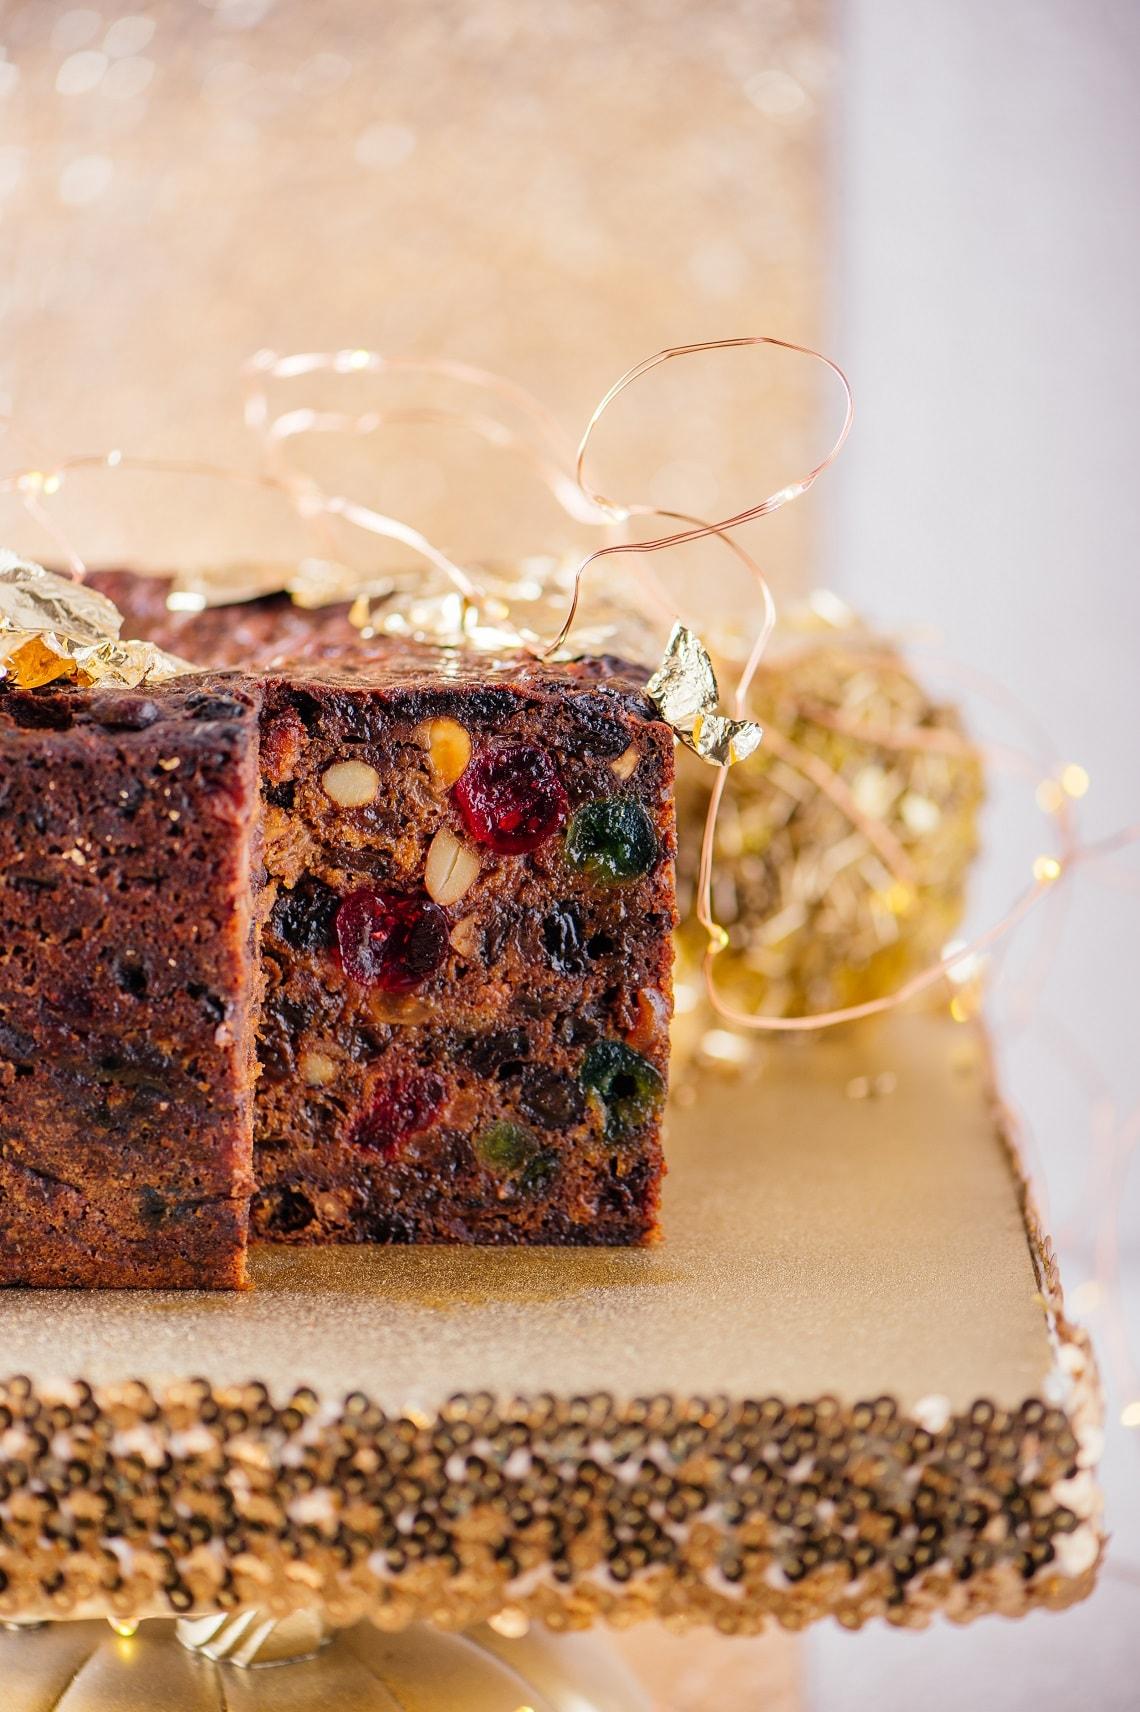 Chef Mynhardt's heavenly fruitcake to warm hearts this festive season